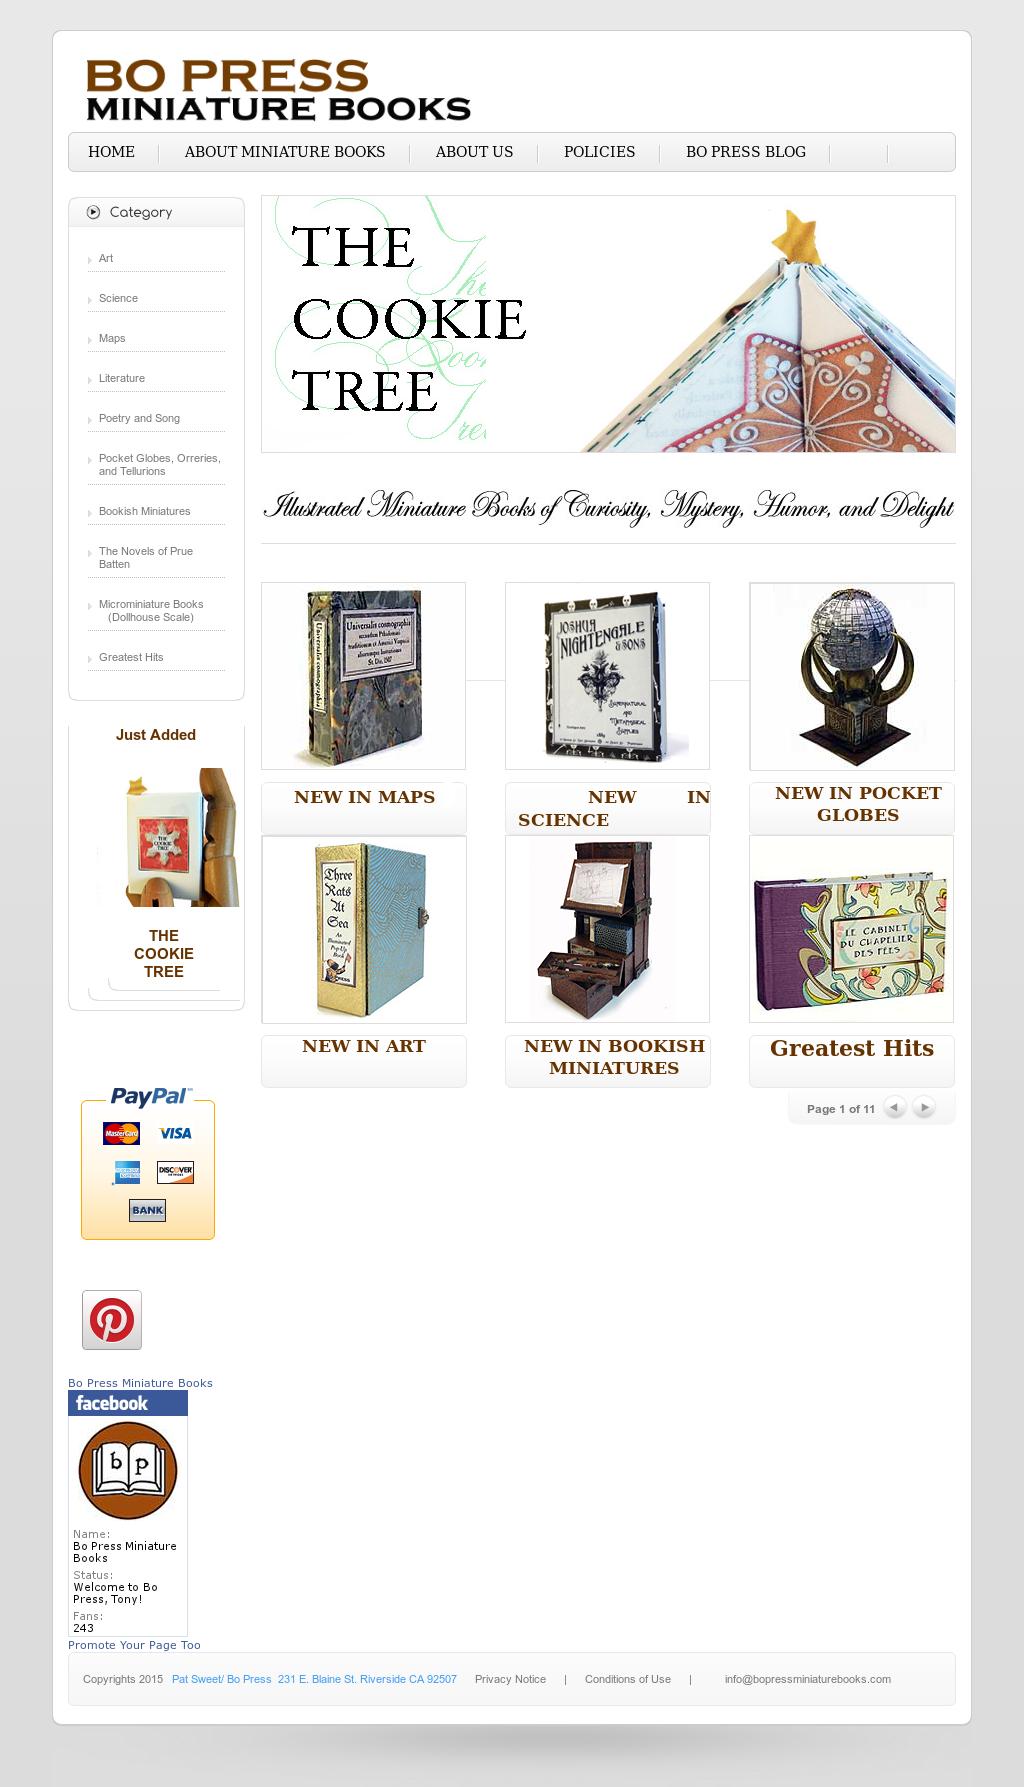 Bo Press Miniature Books Competitors, Revenue and Employees